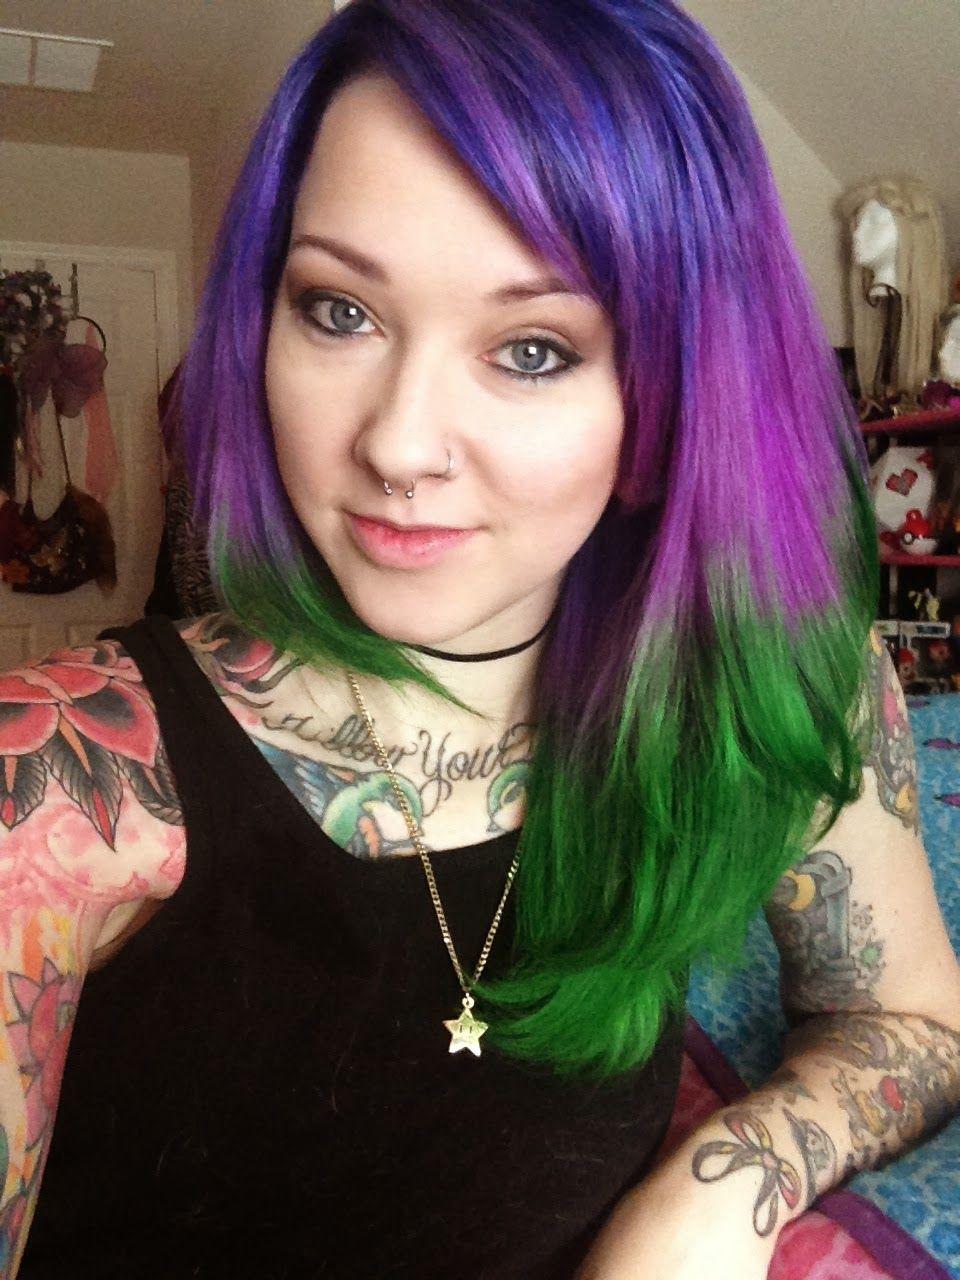 Glitzy Geek Girl Purple And Green Hair Green Hair Purple And Green Hair Turquoise Hair Color